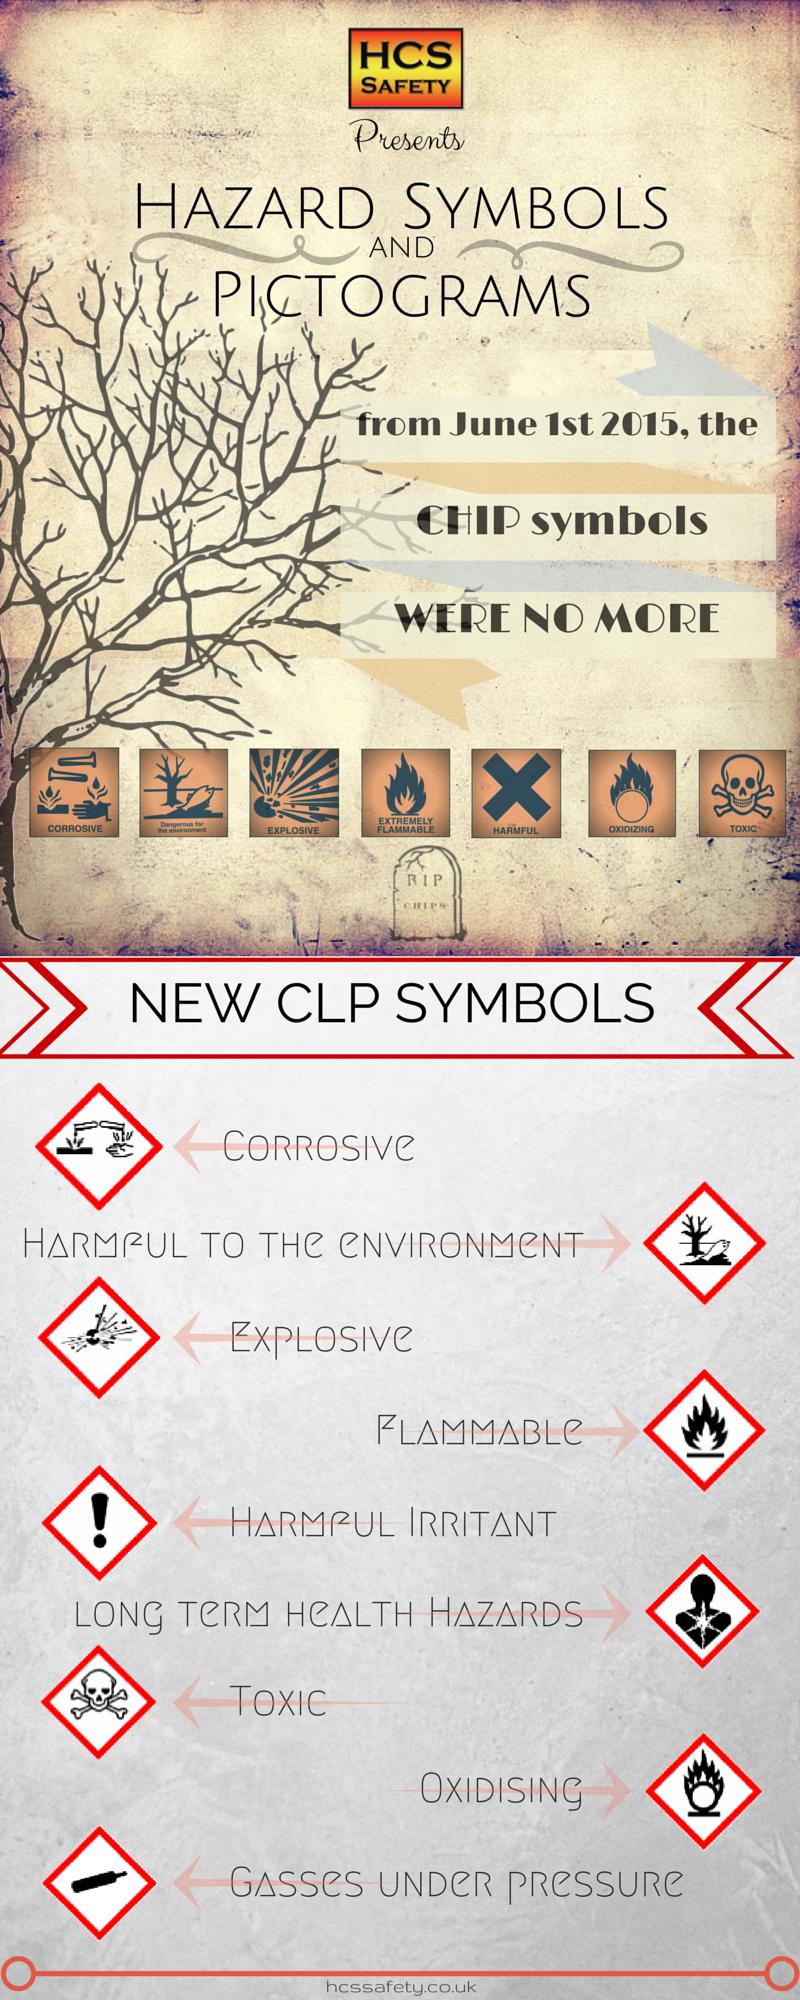 The change in Hazard Symbols Safety training, Fire risk